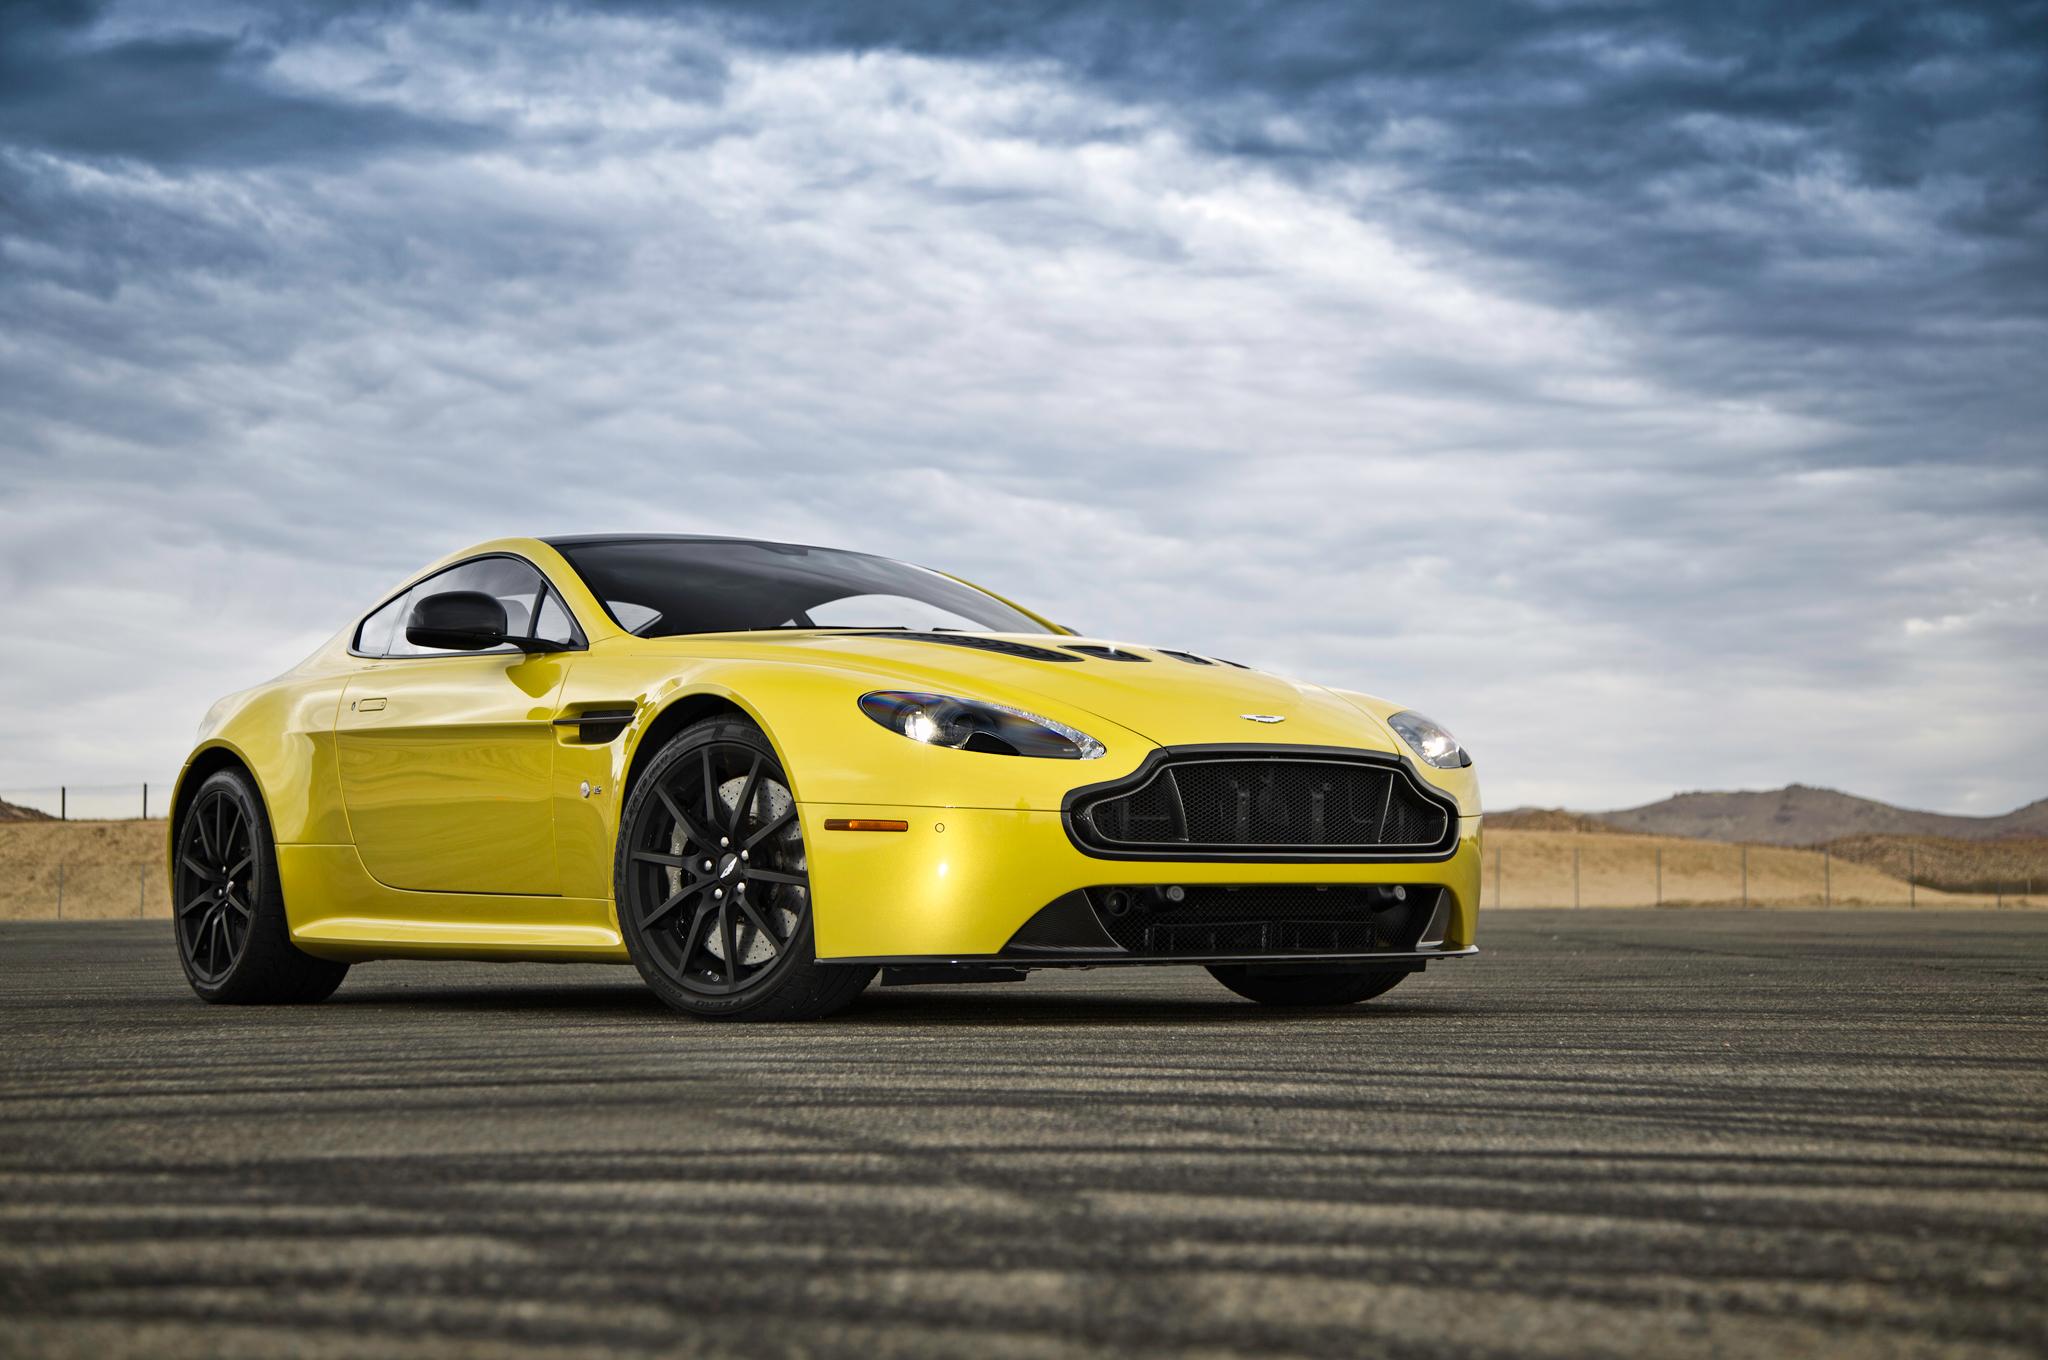 HQ 2014 Aston Martin V12 Vantage S Wallpapers | File 1451.52Kb